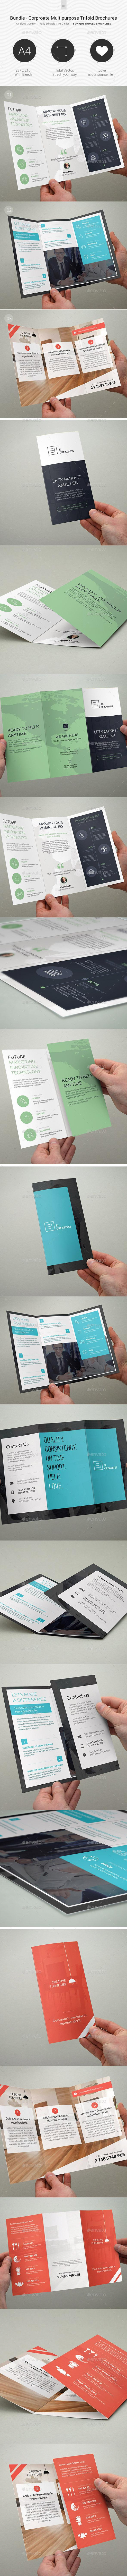 Bundle - Multipurpose Trifold Brochures - 06 - Corporate Brochures